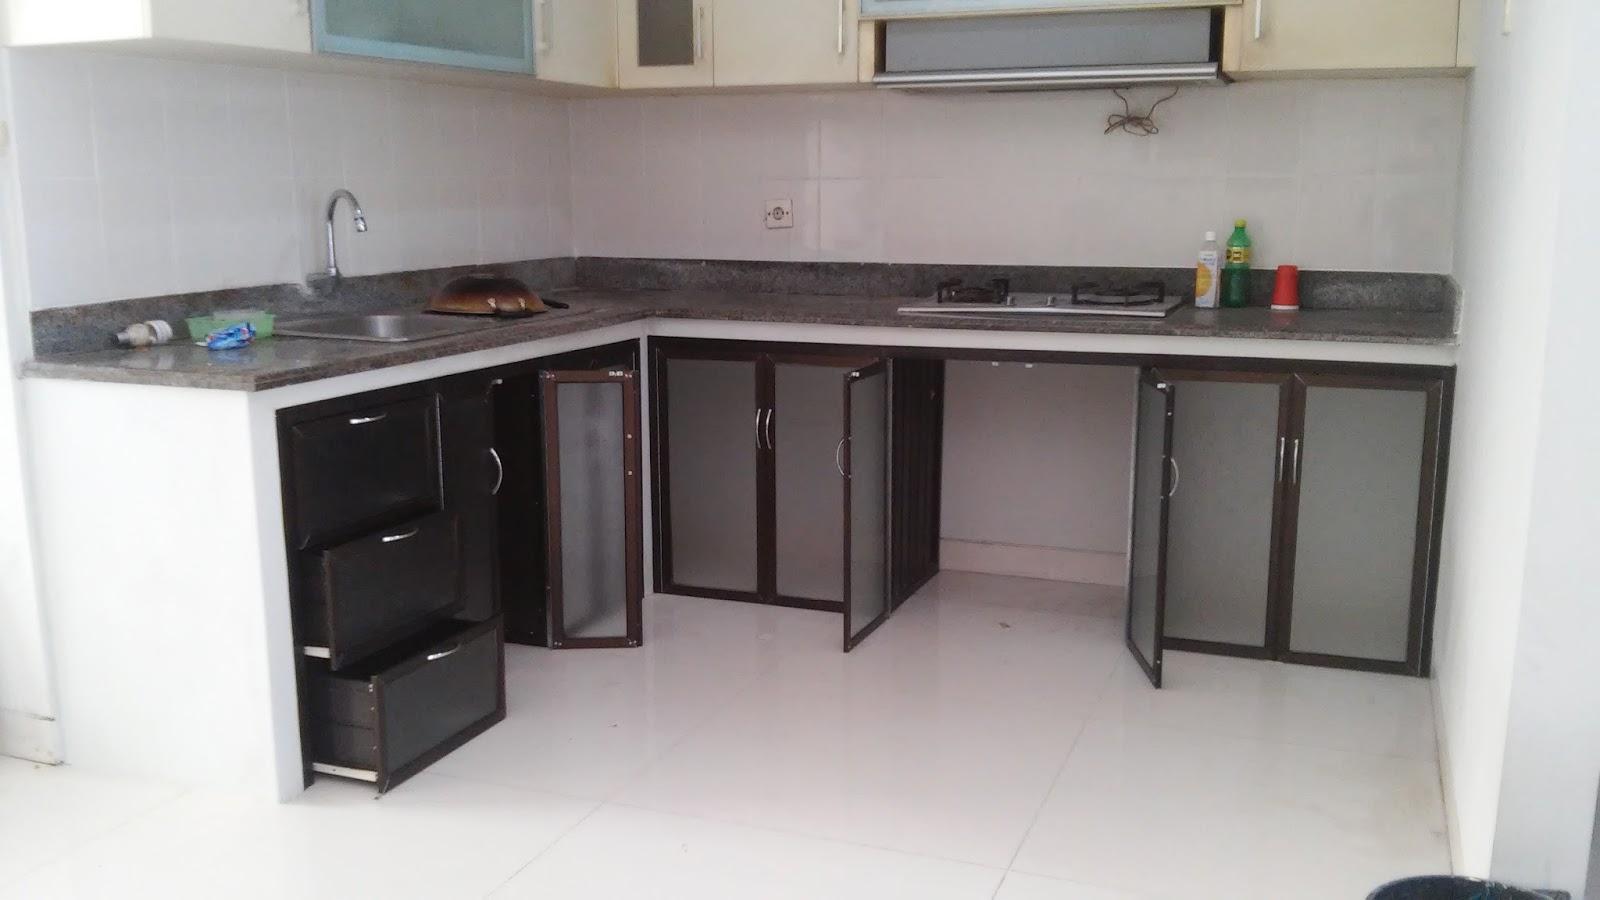 Laris Pro Alumunium Kaca Surabaya Tutup Dapur Bawah